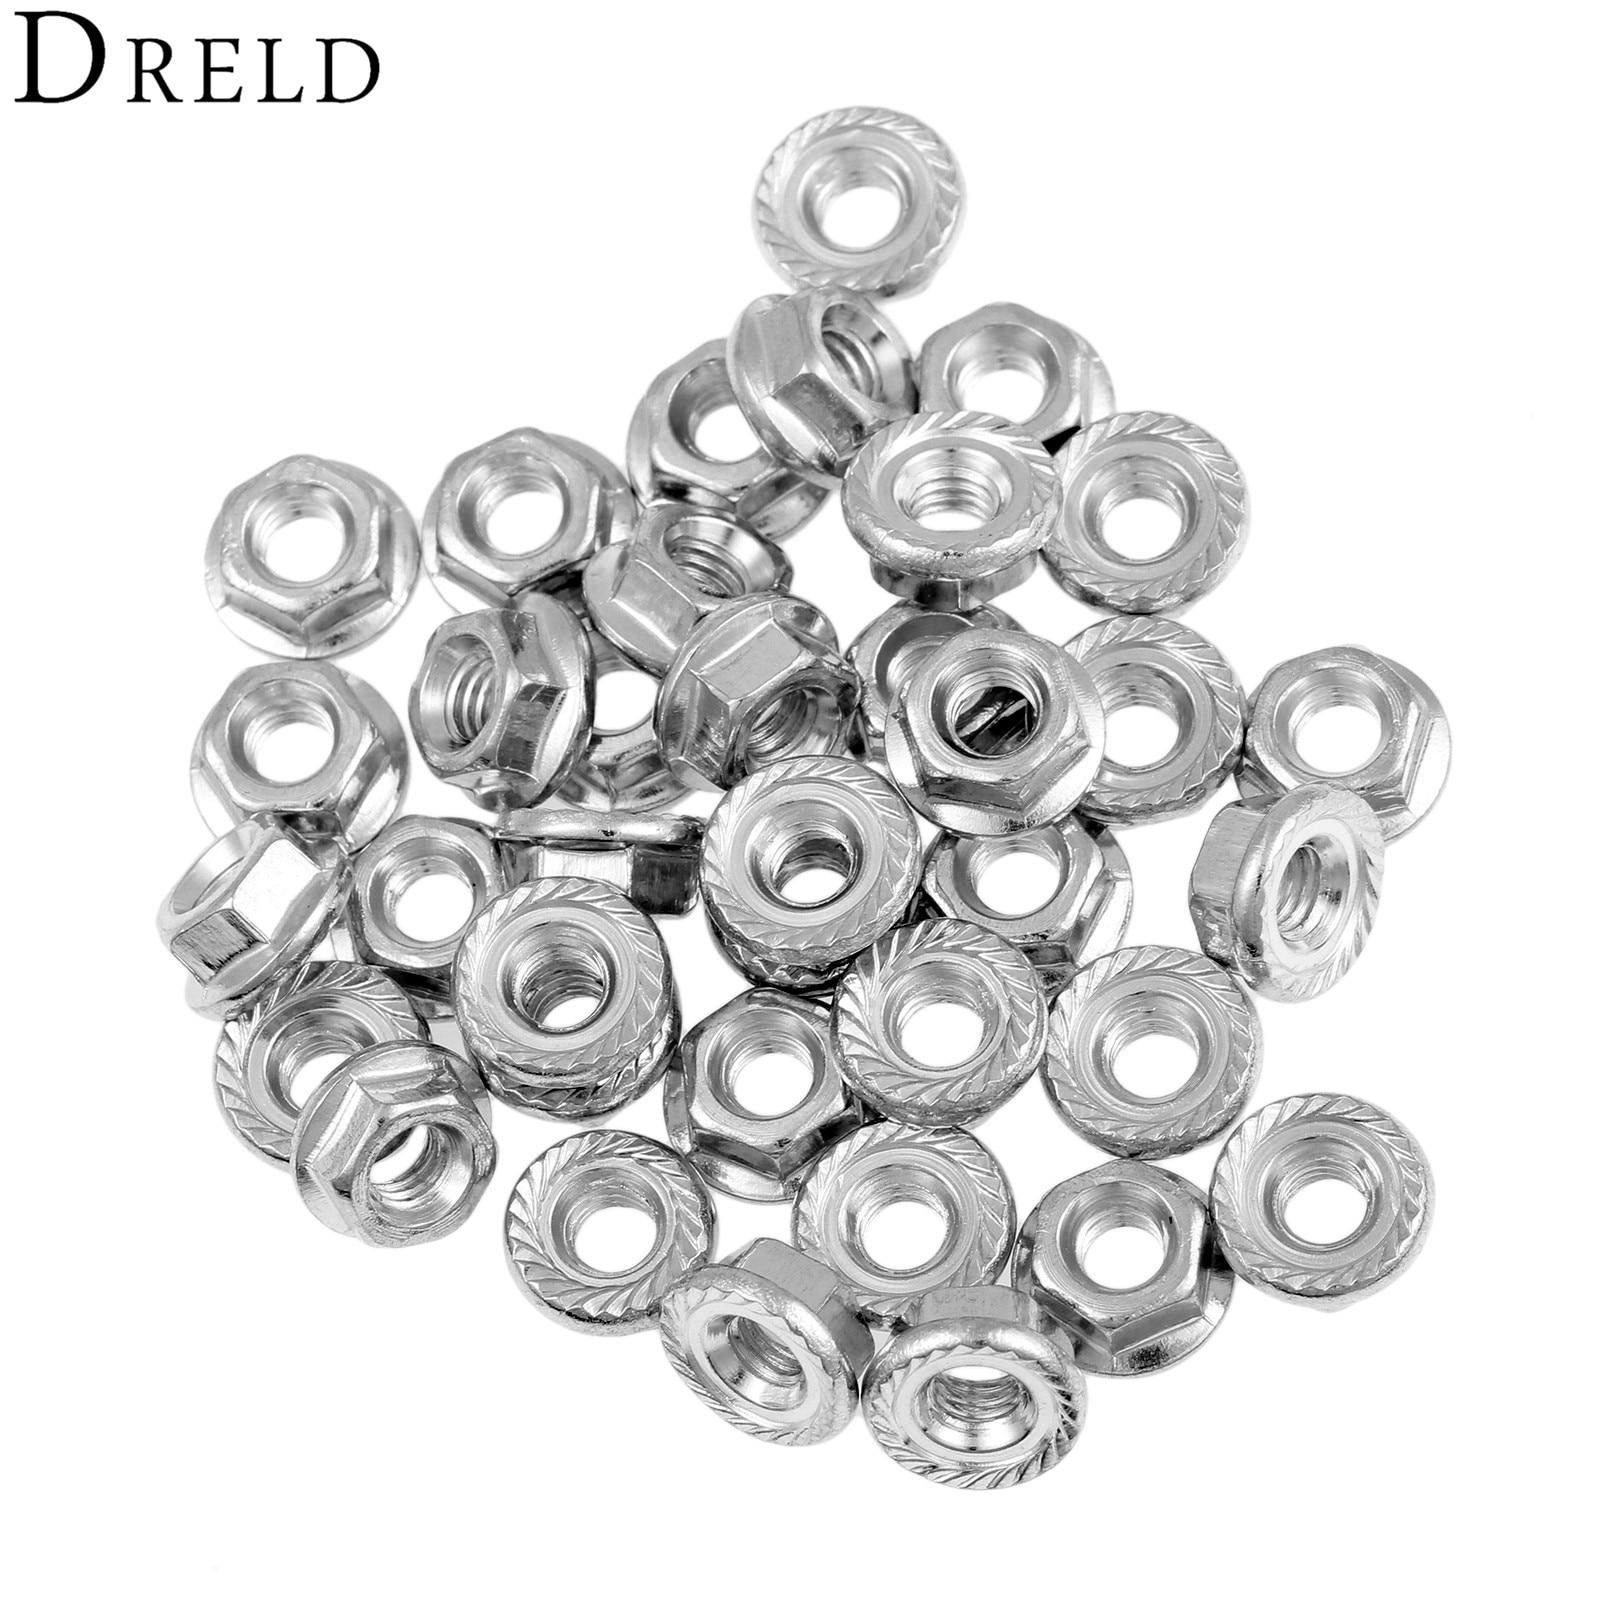 DRELD 50Pcs/lot Metric Thread M3 M4 M5 Carbon Steel Hex Flange Nut Hexagon Nut Lock Nut чехол для iphone 6 глянцевый printio kiss кисс